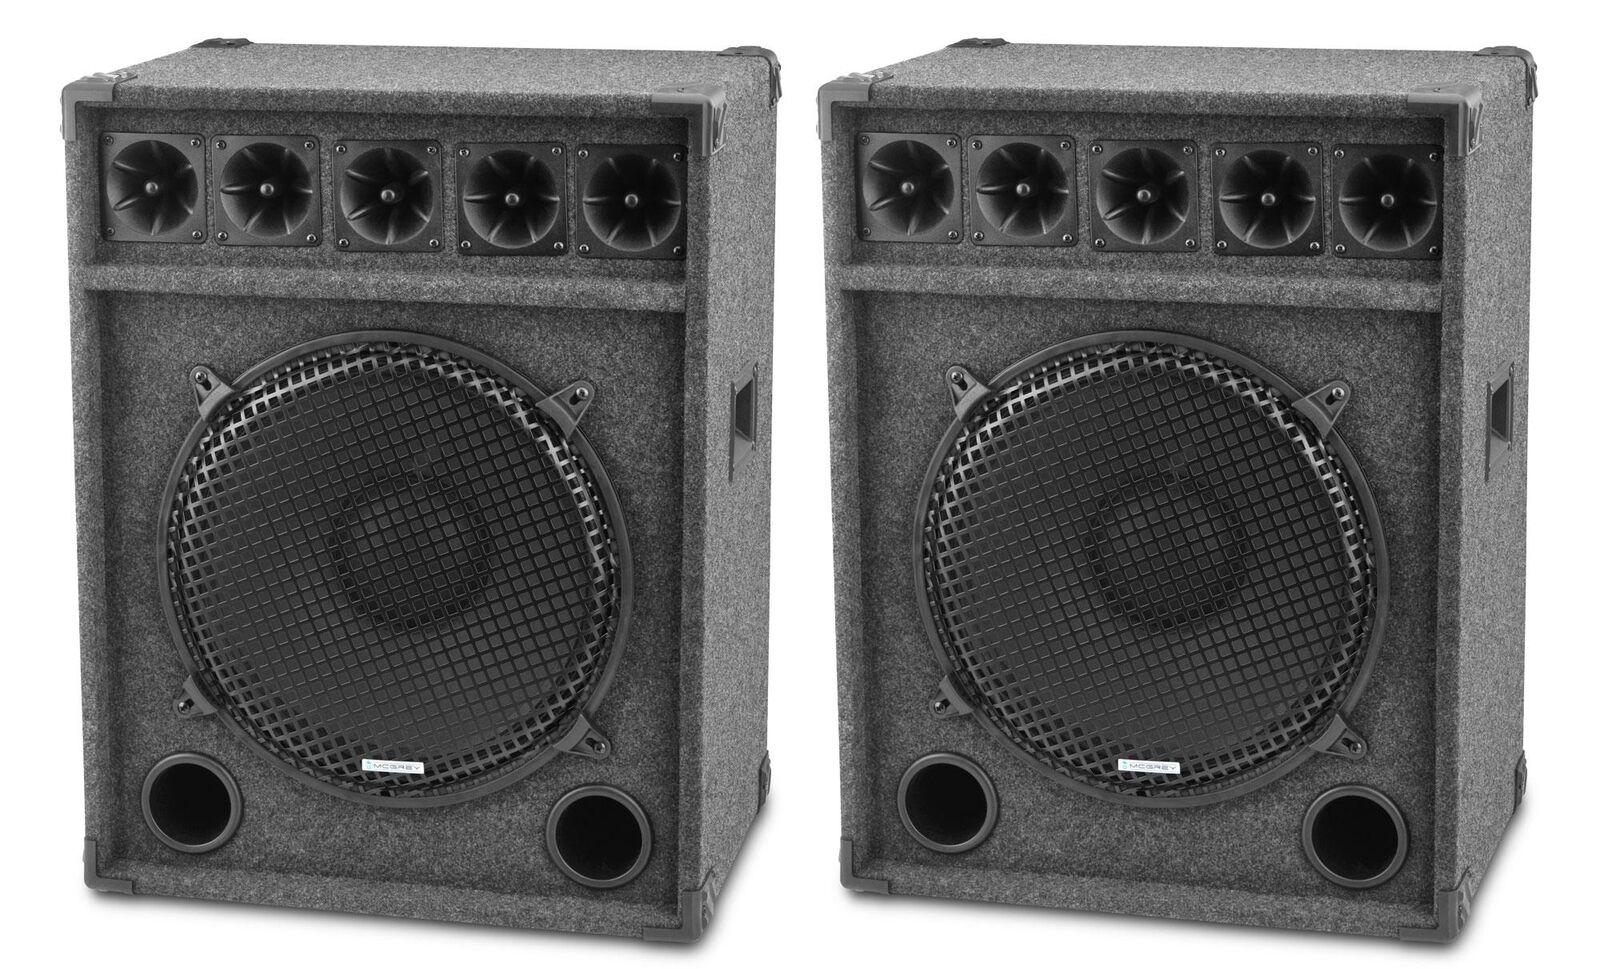 2x 15  (38cm) Cajas Altavoces DJ PA Subwoofer Bass Reflex Festival Box 1200w Set